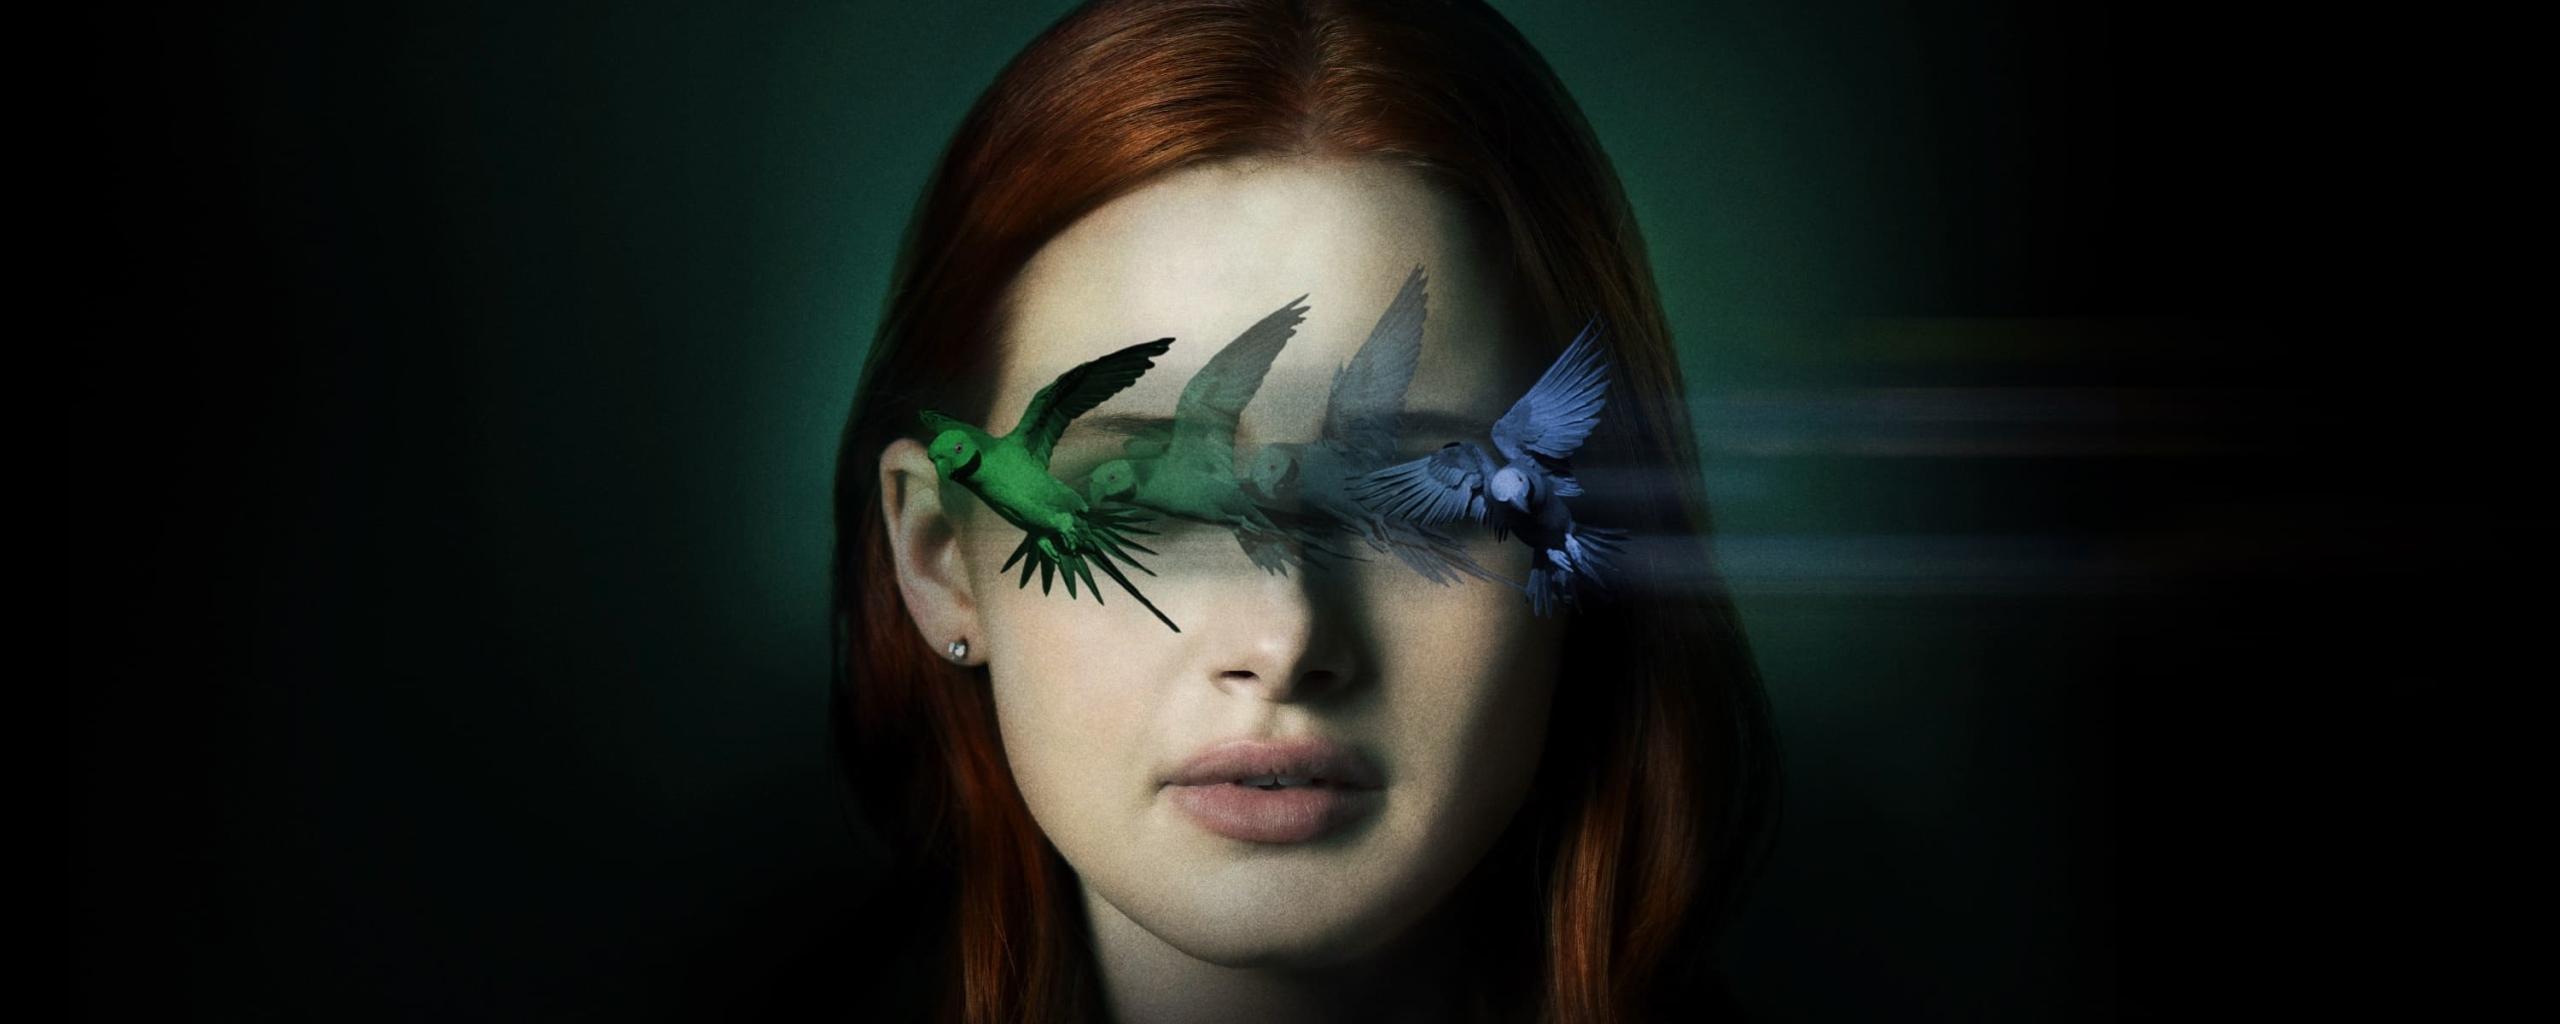 Madelaine Petsch Sightless Movie Wallpaper in 2560x1024 Resolution